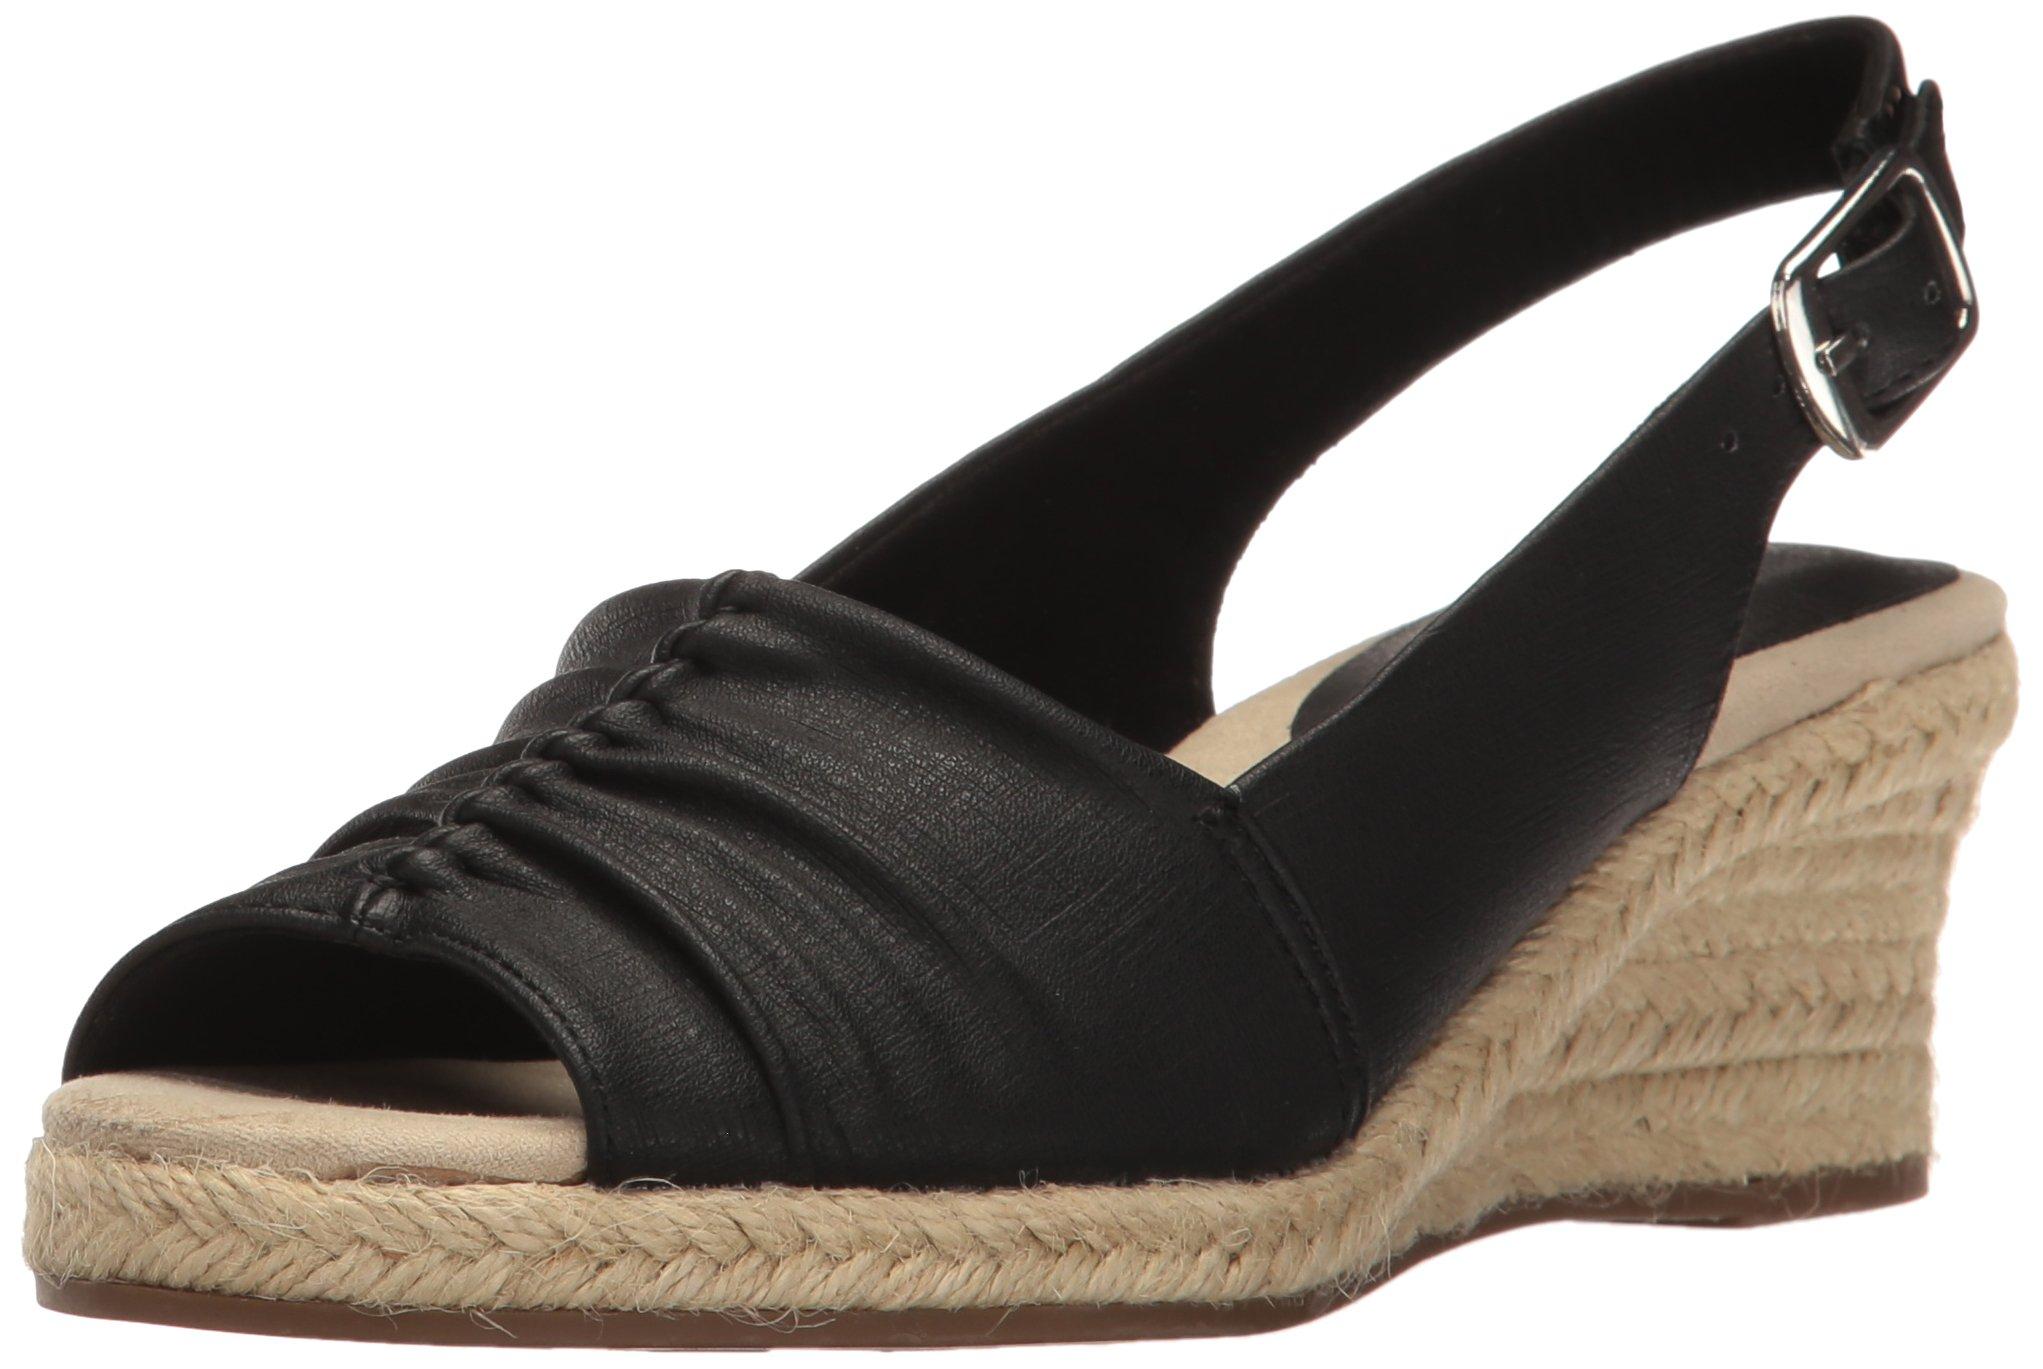 Easy Street Women's Kindly Espadrille Wedge Sandal, Black Textured, 7 W US